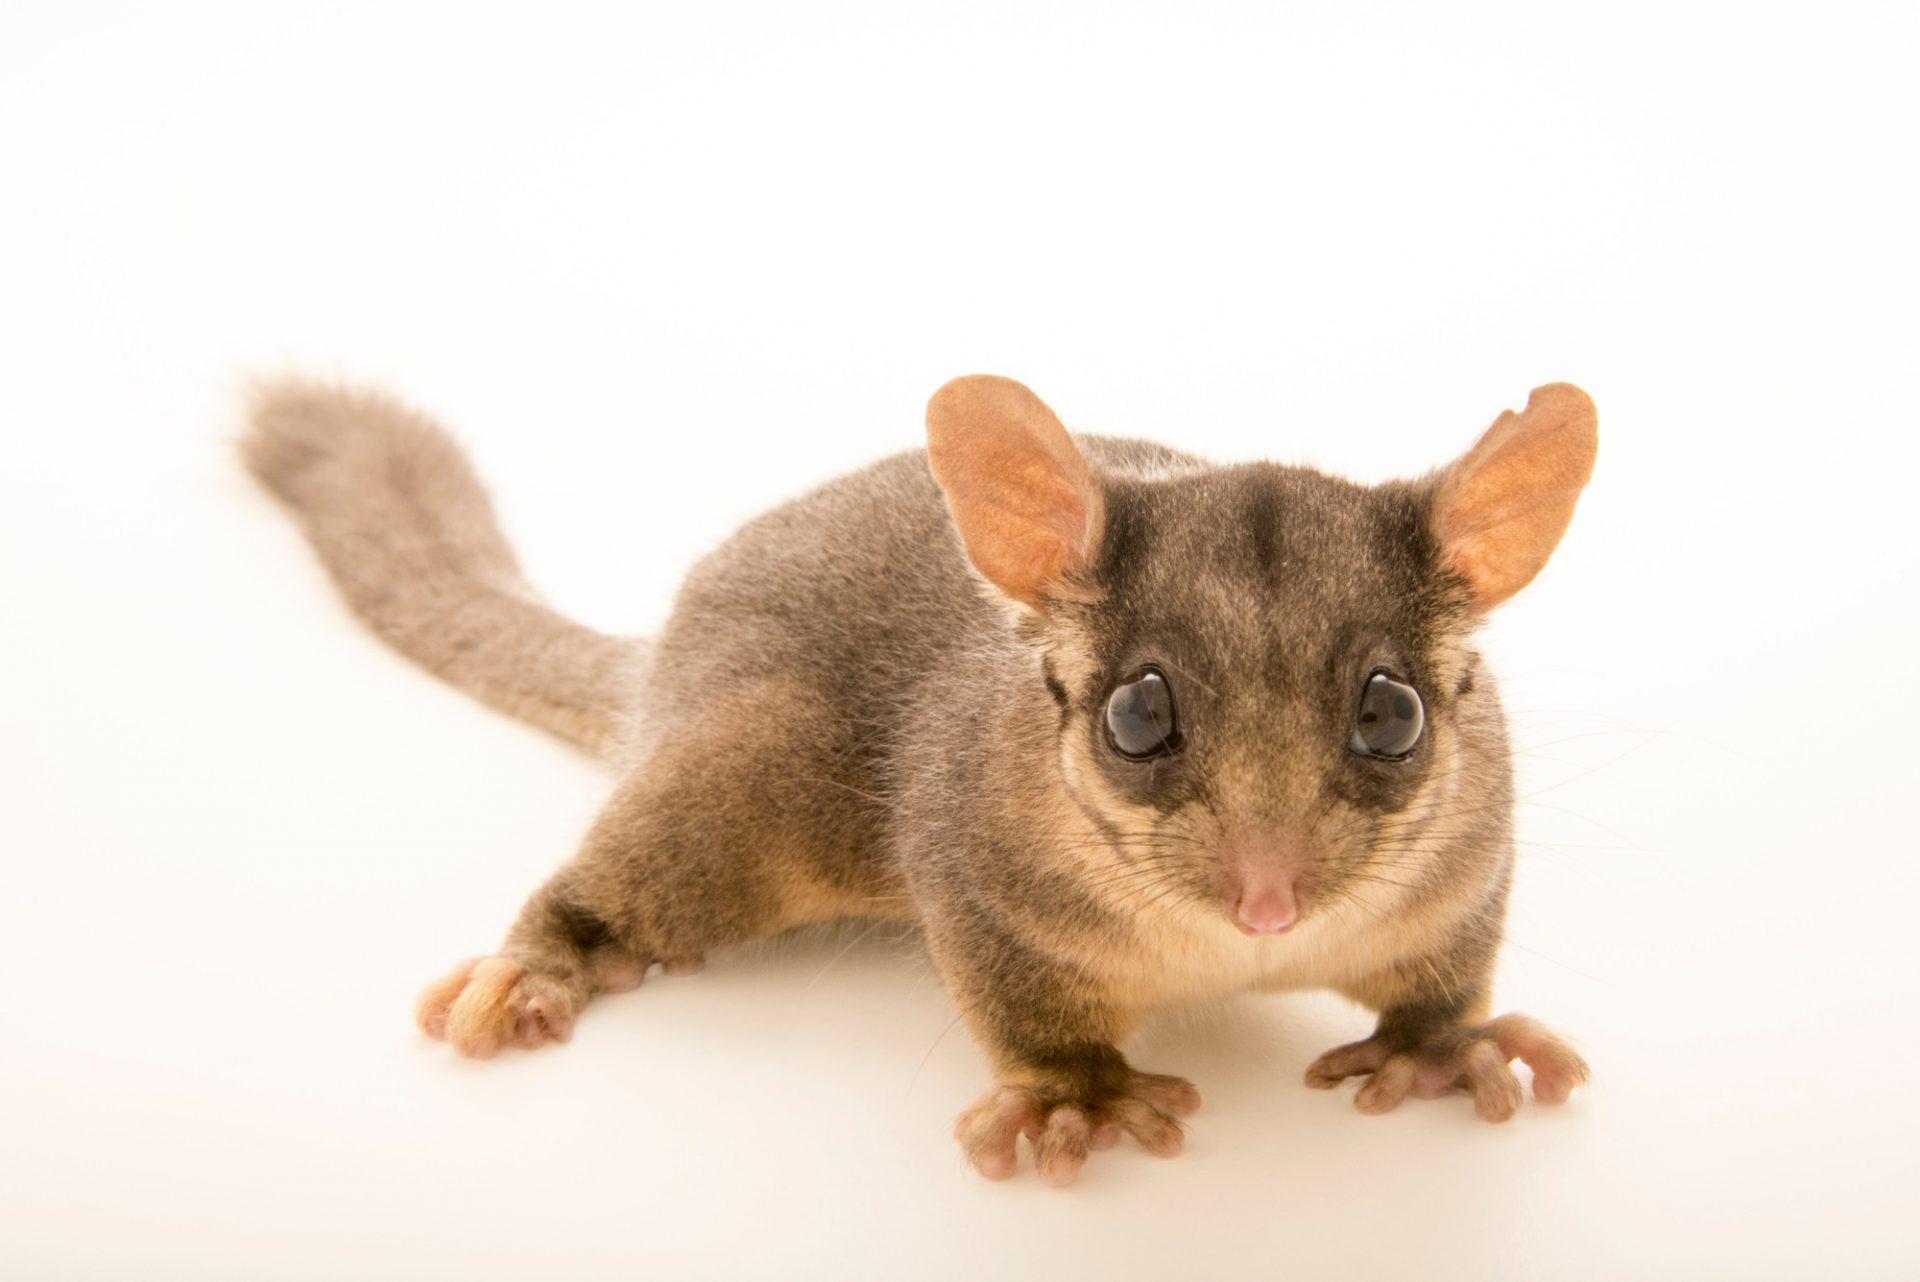 Photo: Critically endangered Leadbeater's possum (Gymnobelideus leadbeateri) at Healesville Sanctuary in Victoria, Australia.